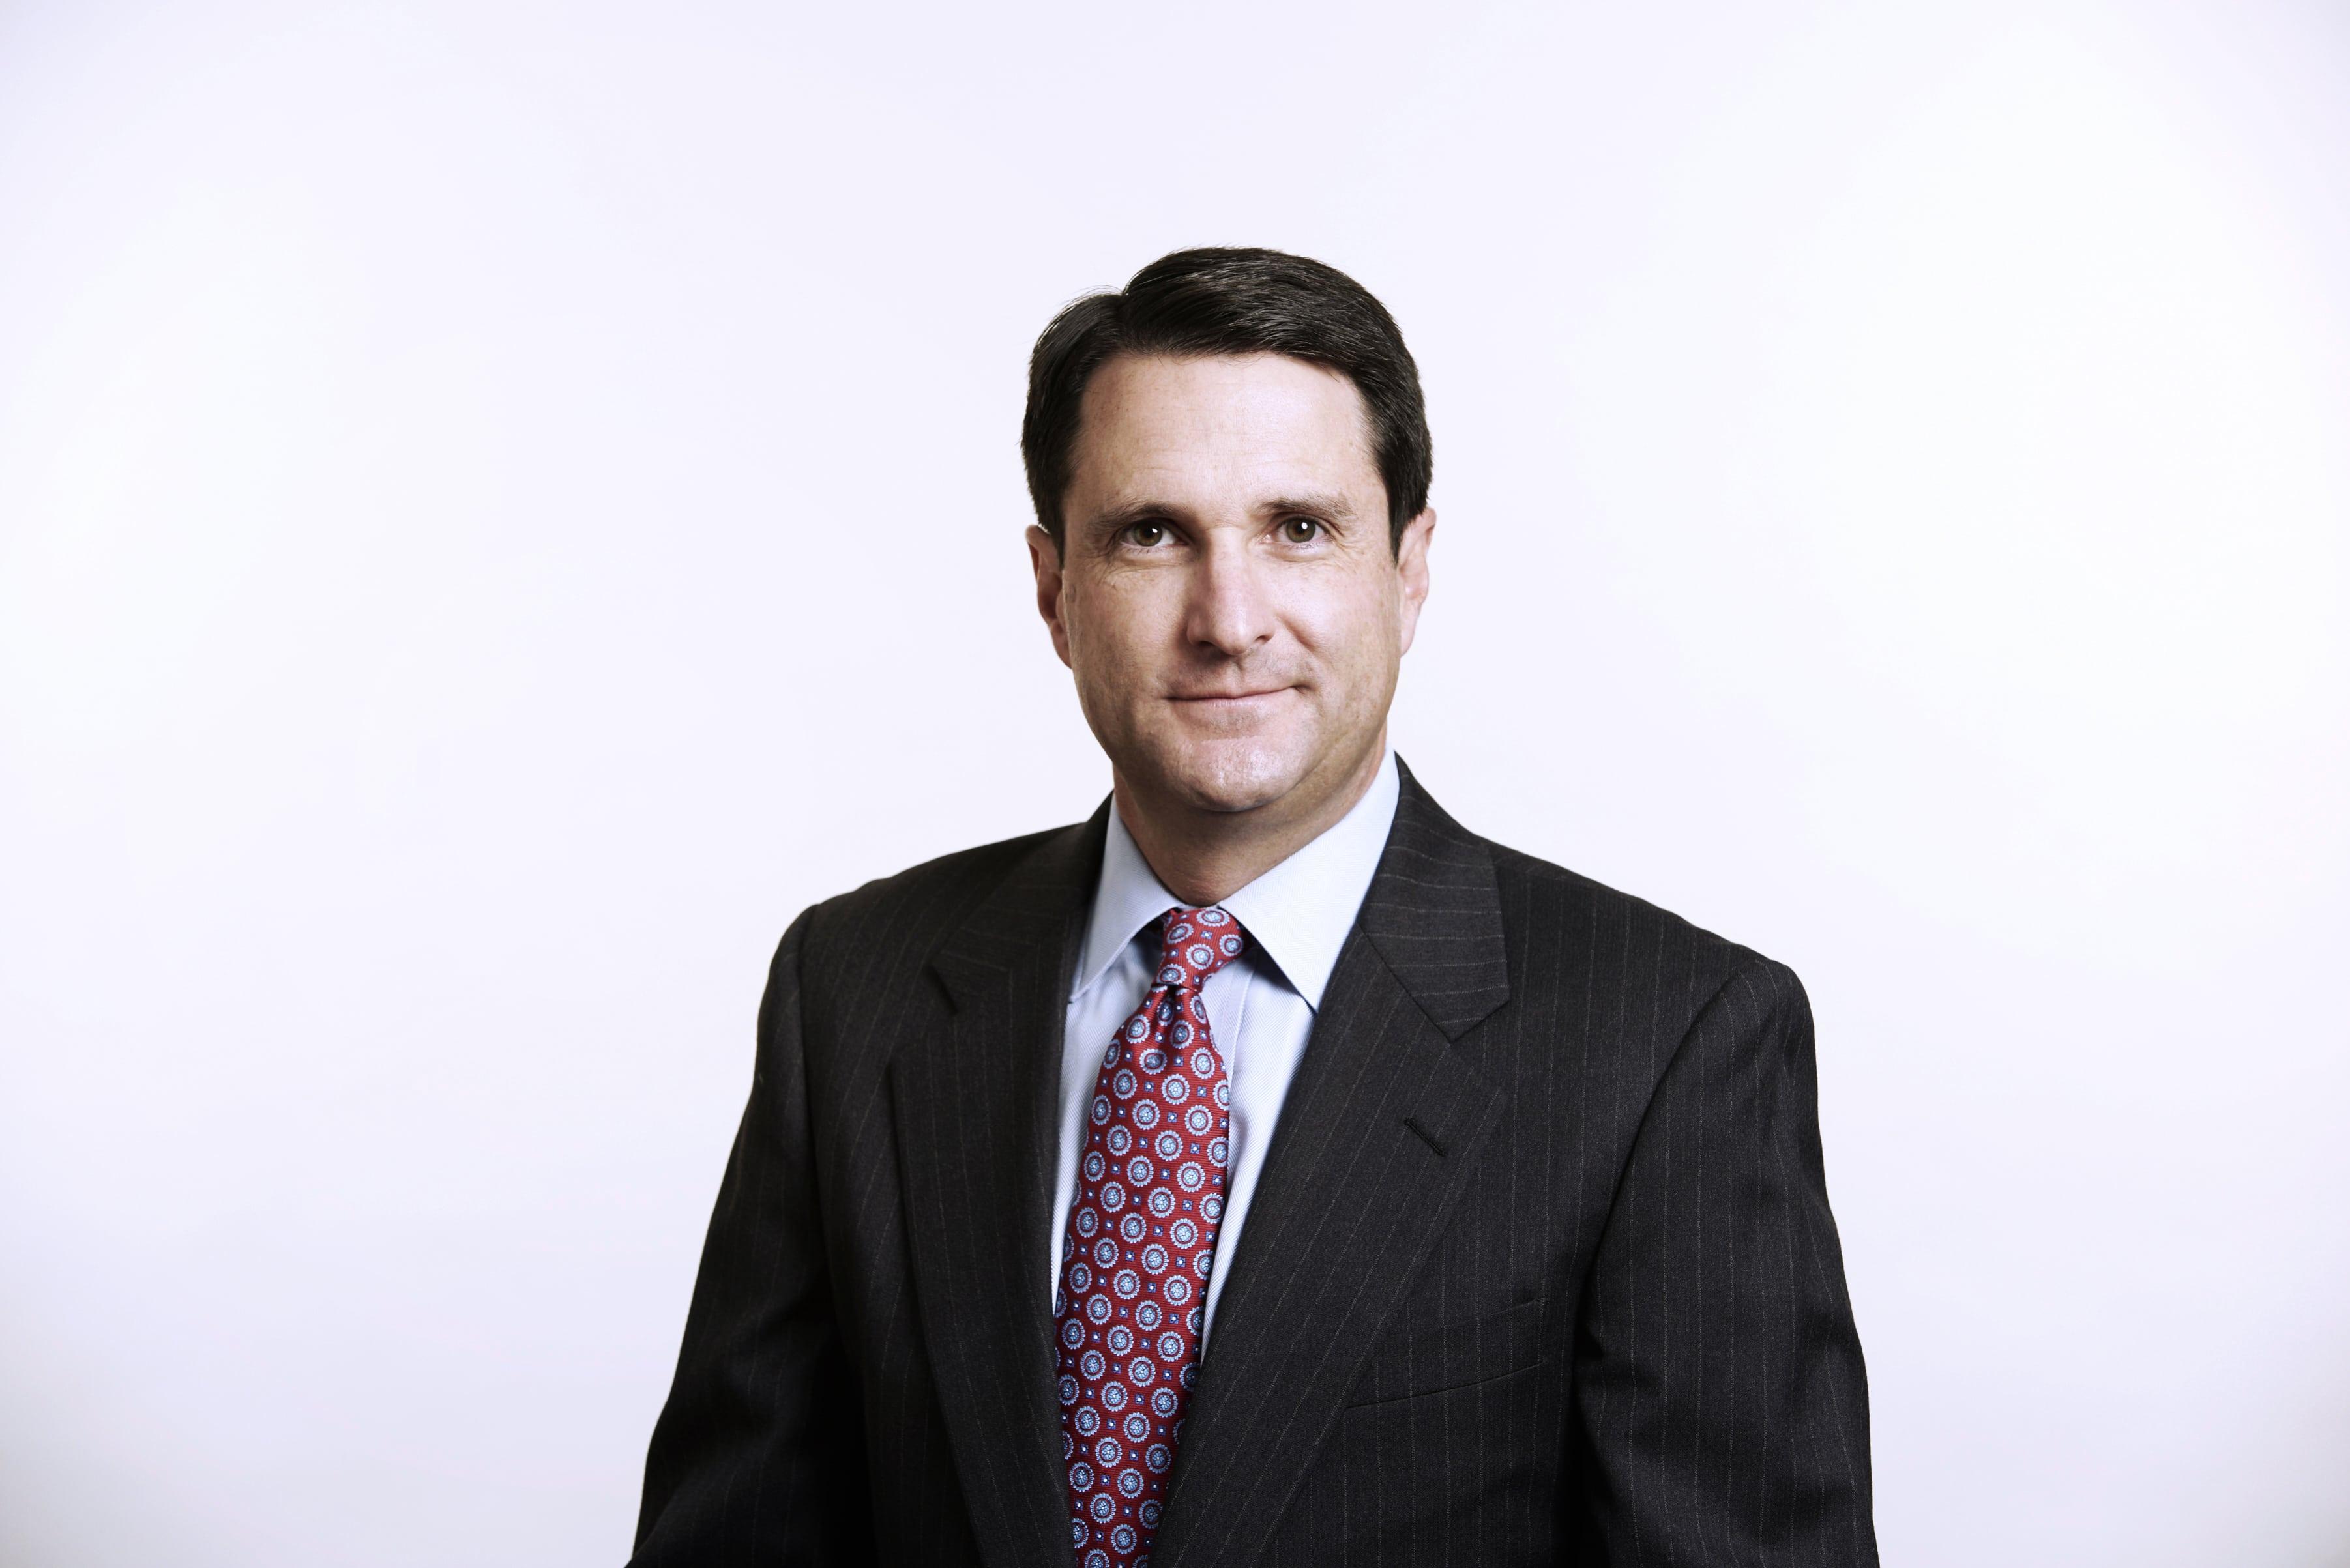 John Spiegleman